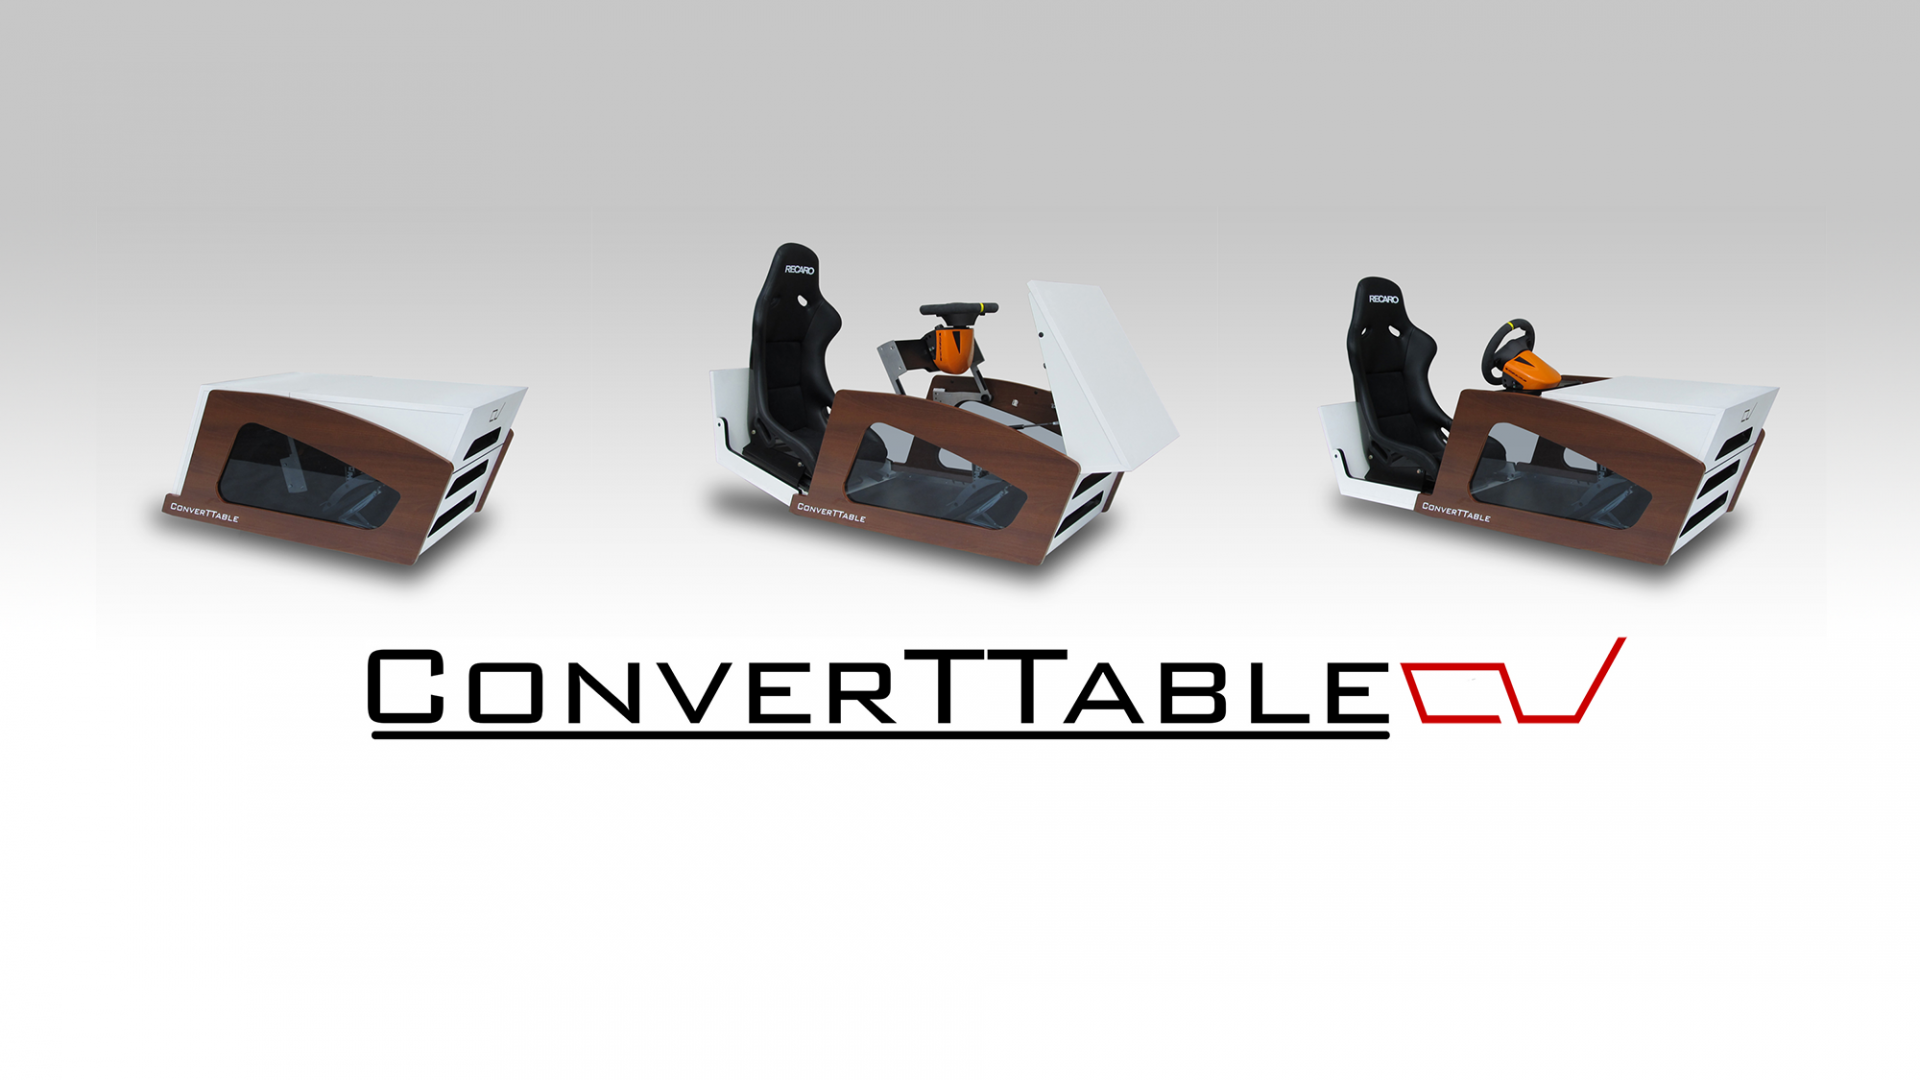 ConverTTable der Design Fahrsimulator